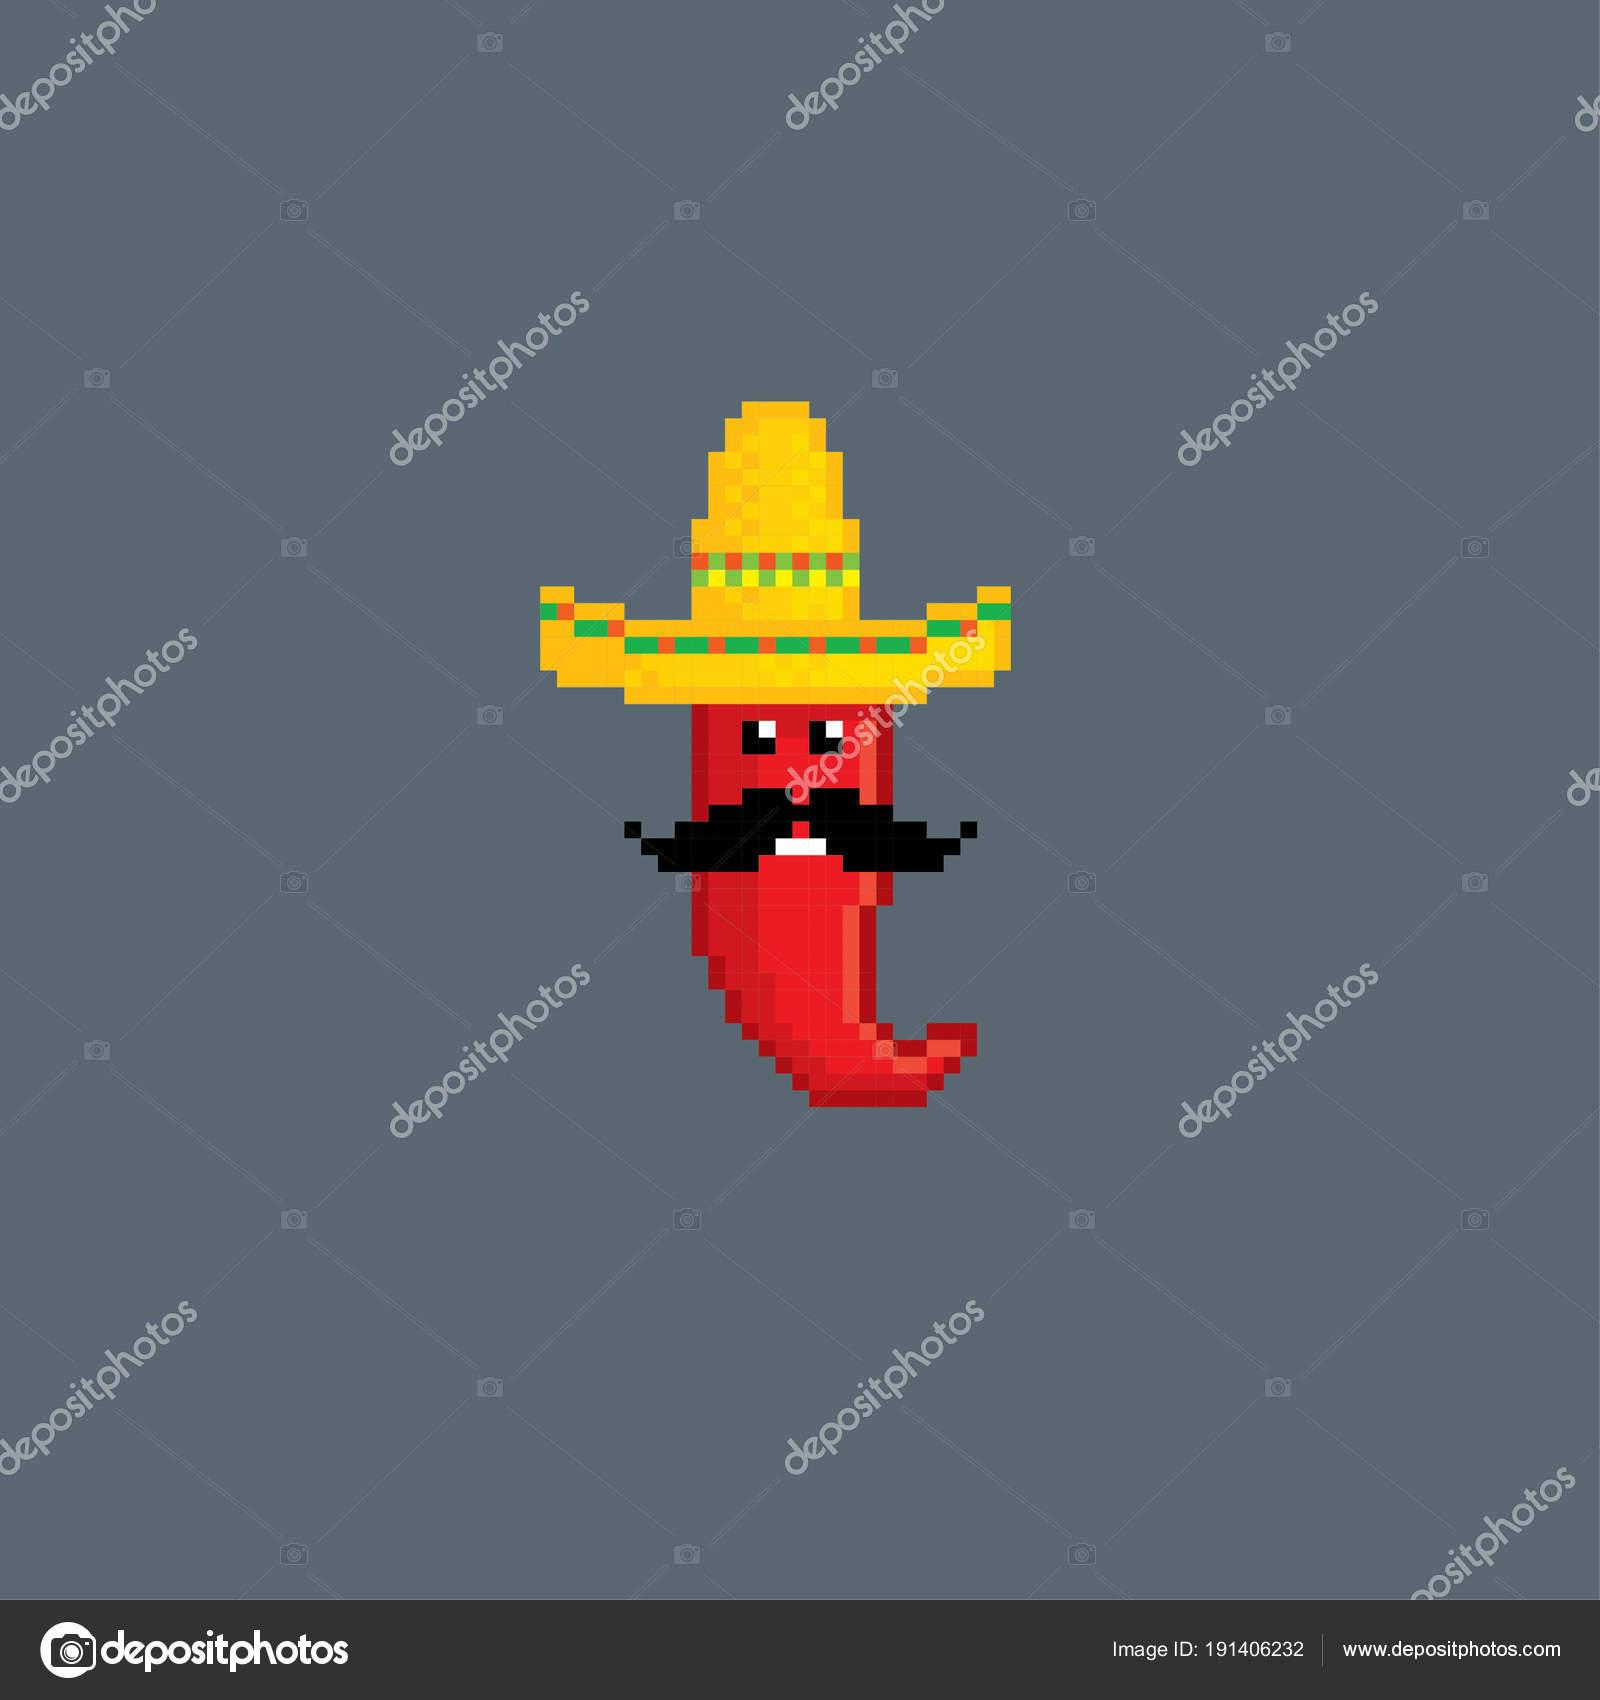 Red Pepper In Sombrero Pixel Art Old School Computer Graphic Style